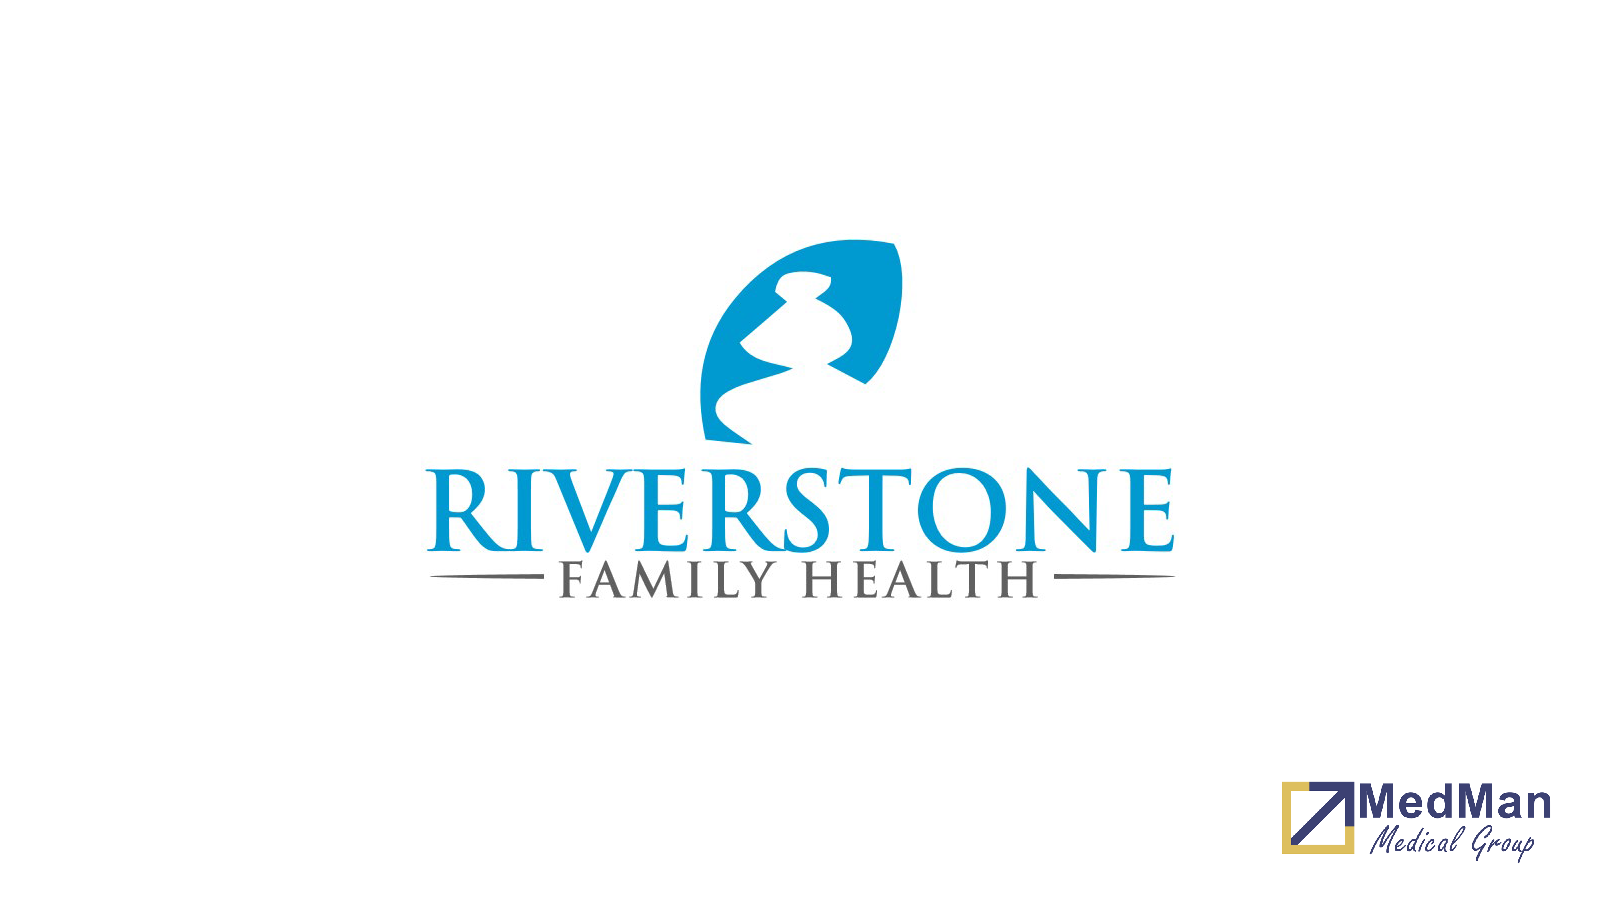 Riverstone-MedMan Signage Logos_Page_1